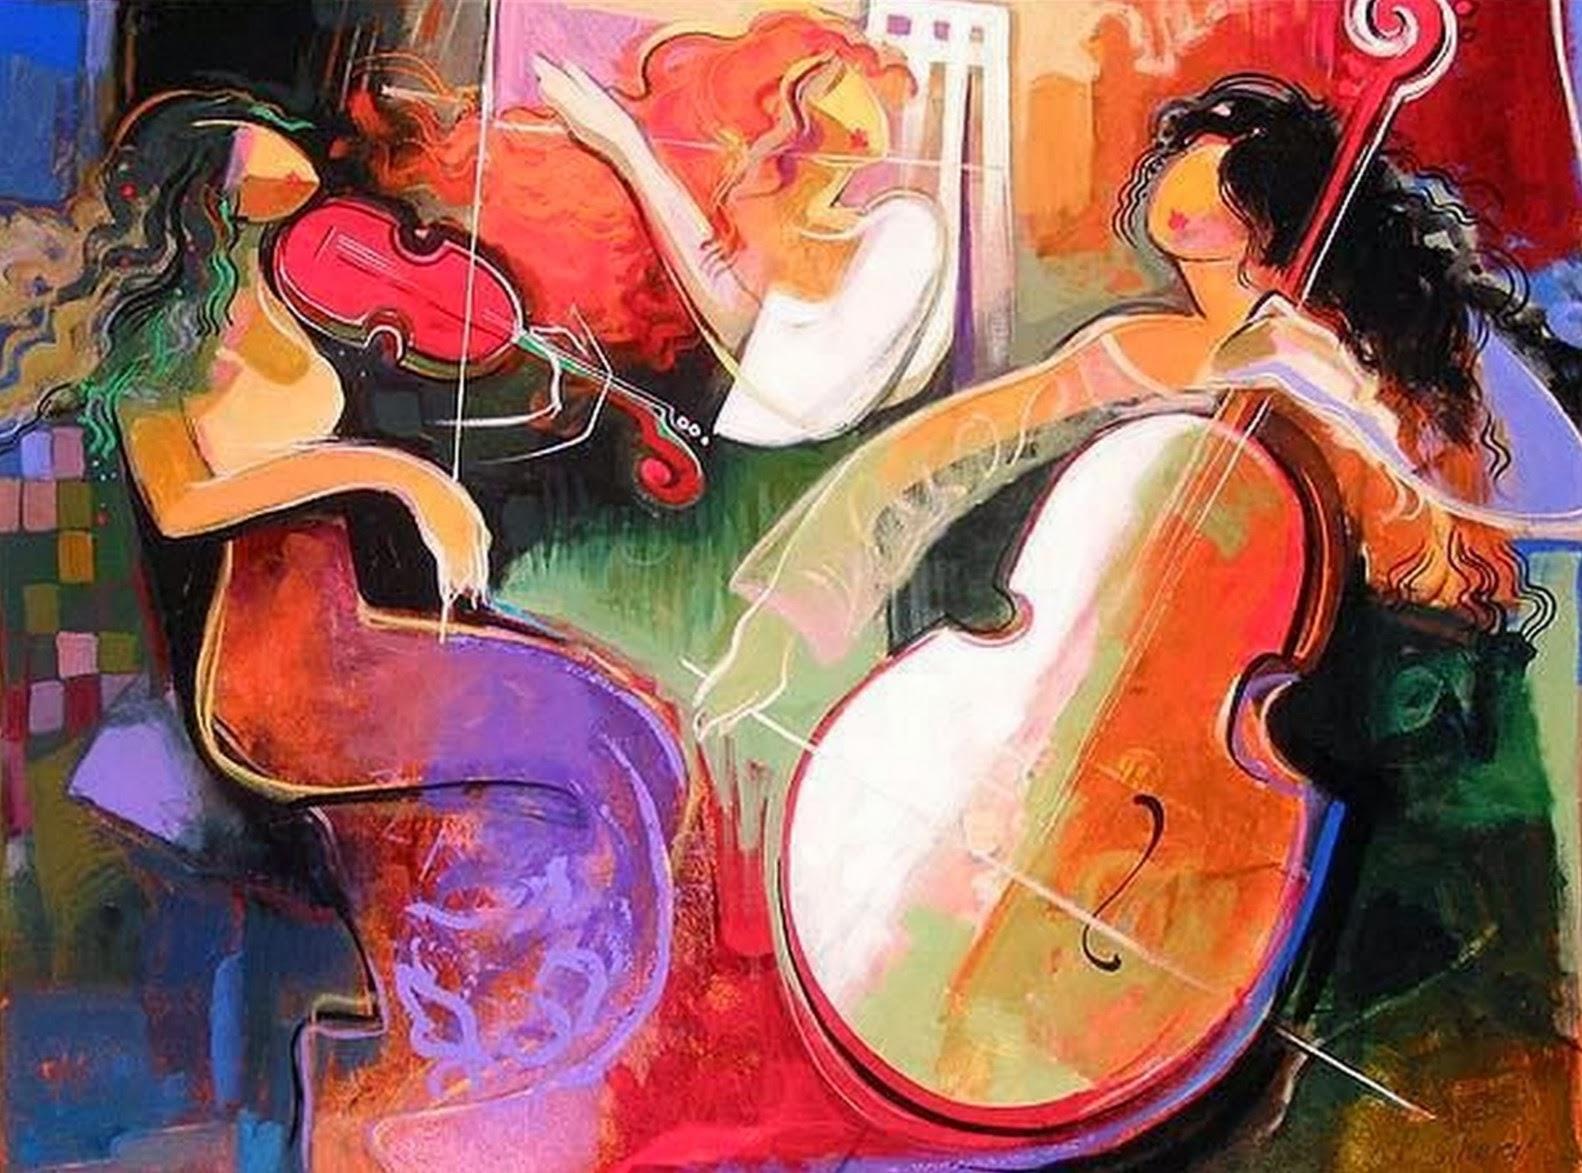 Pinturas de Irene Sheri